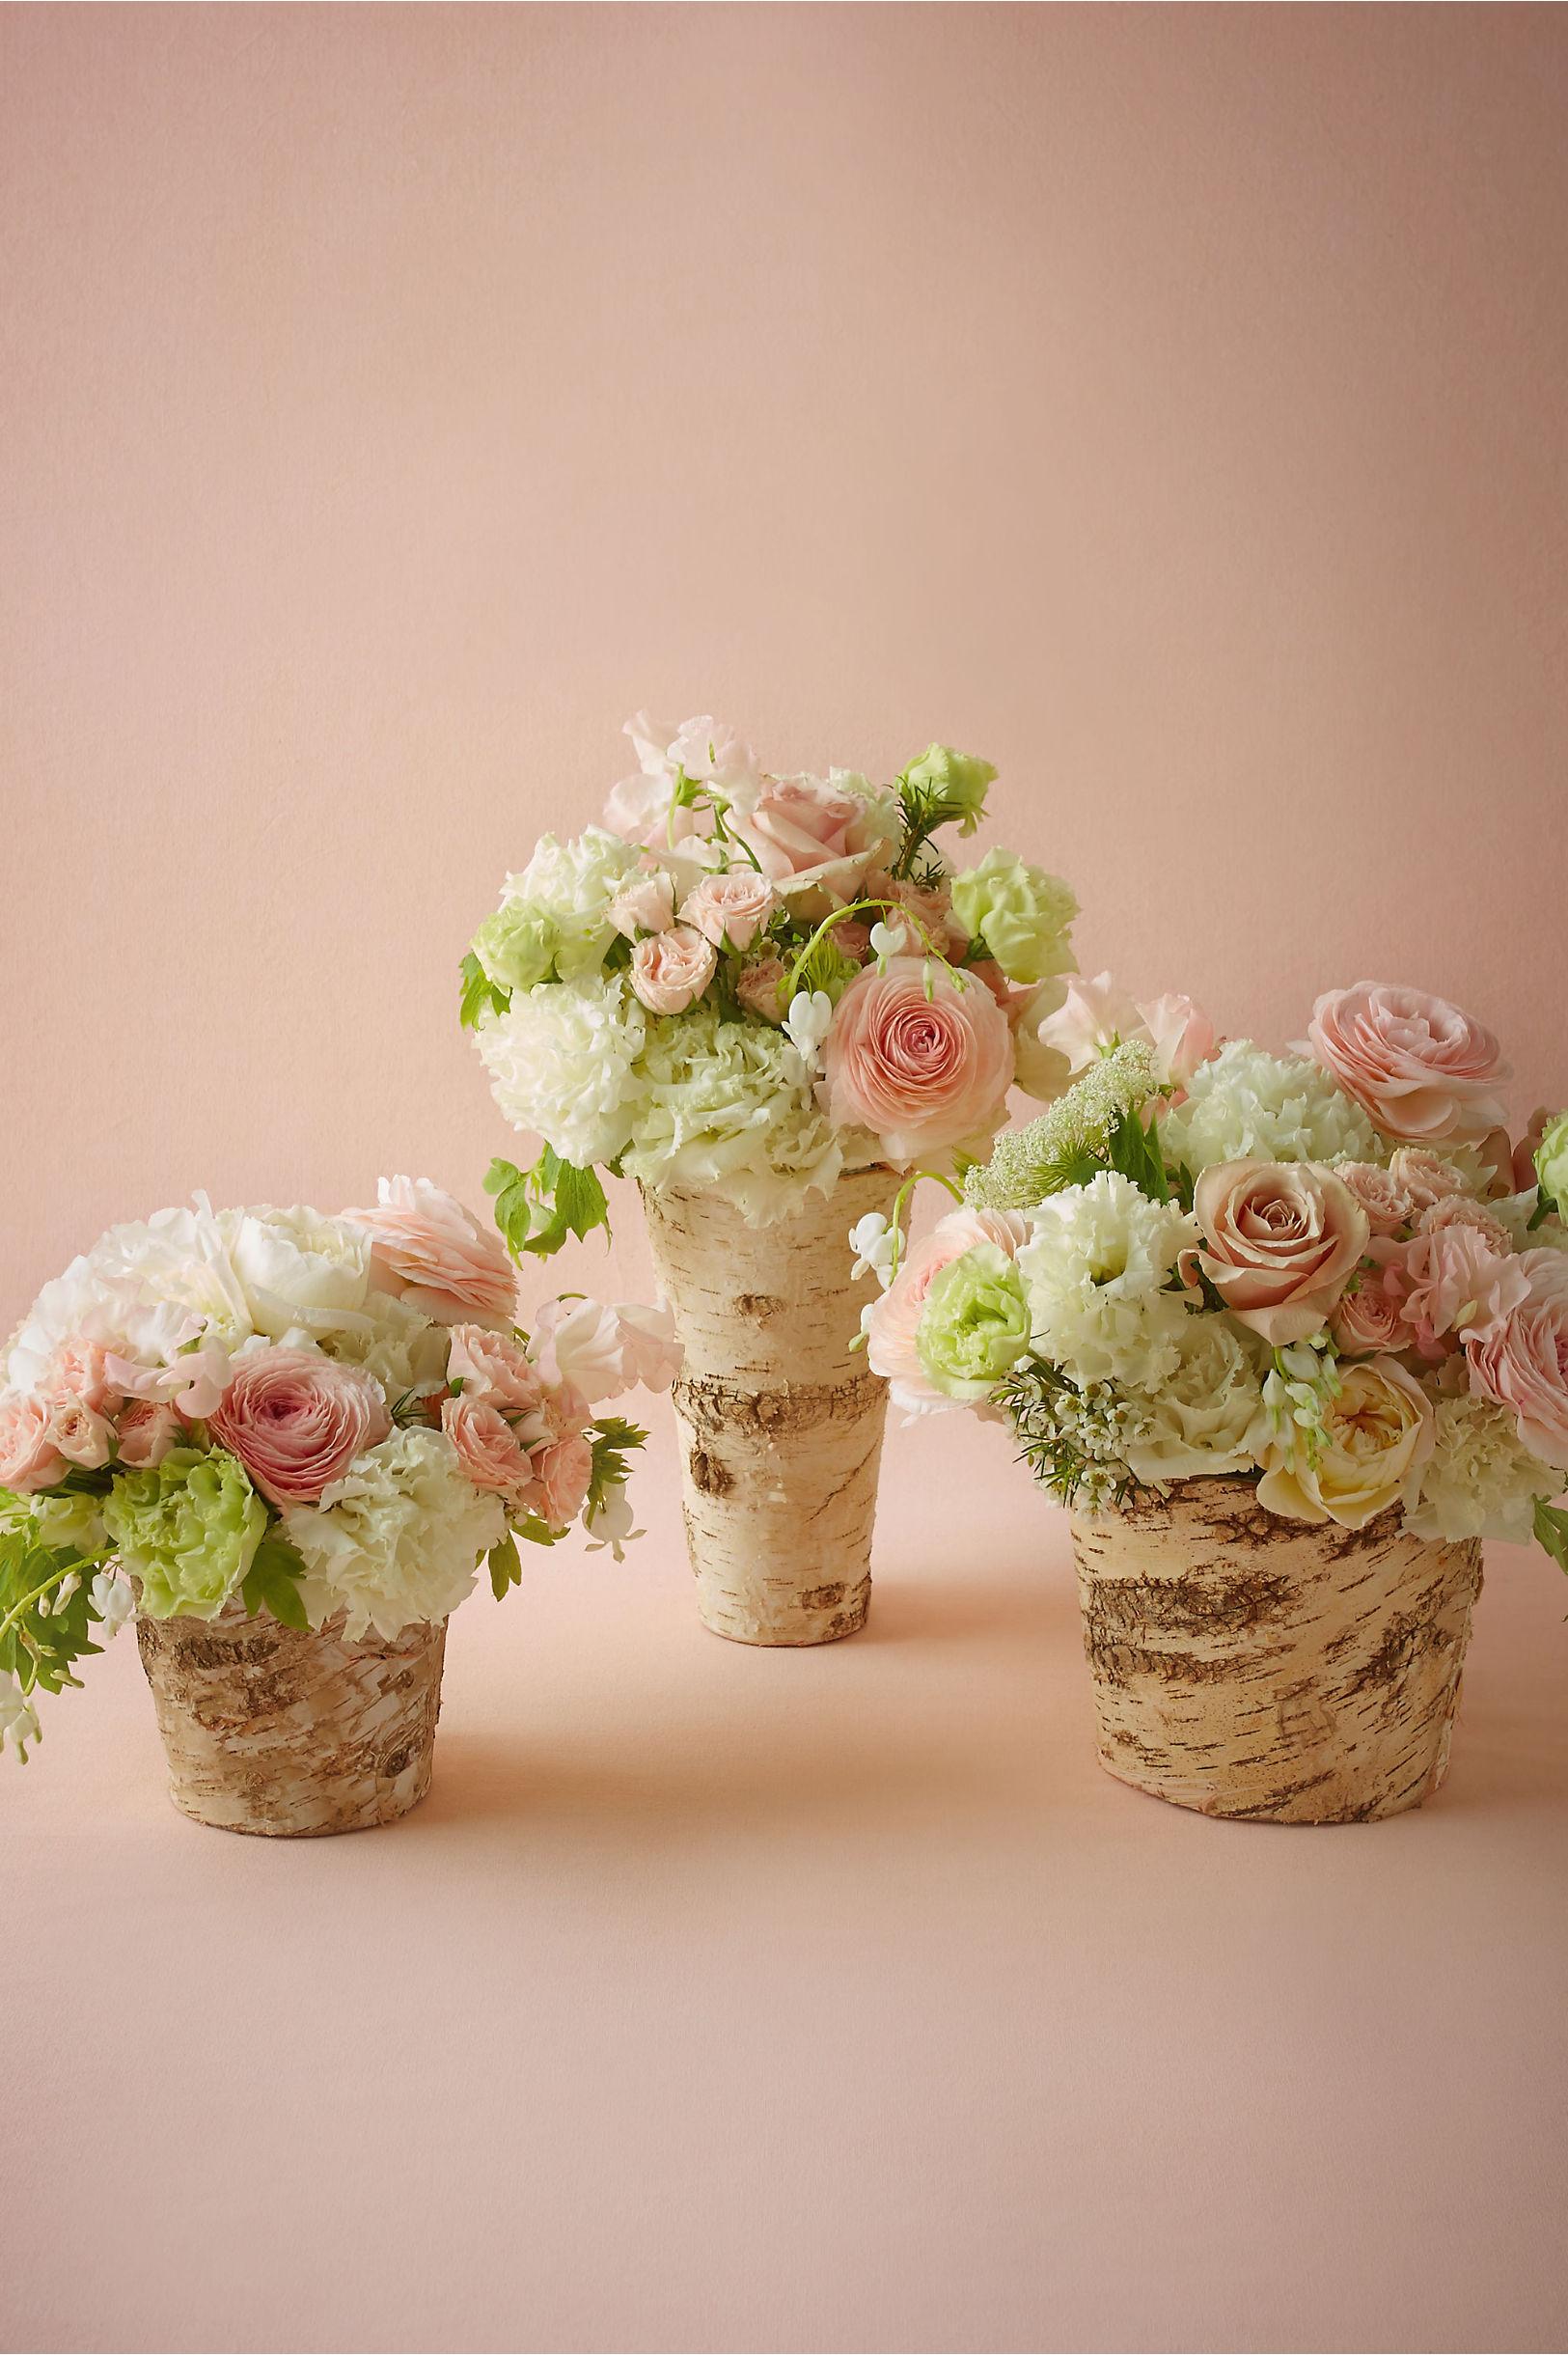 Декор вазы деревом